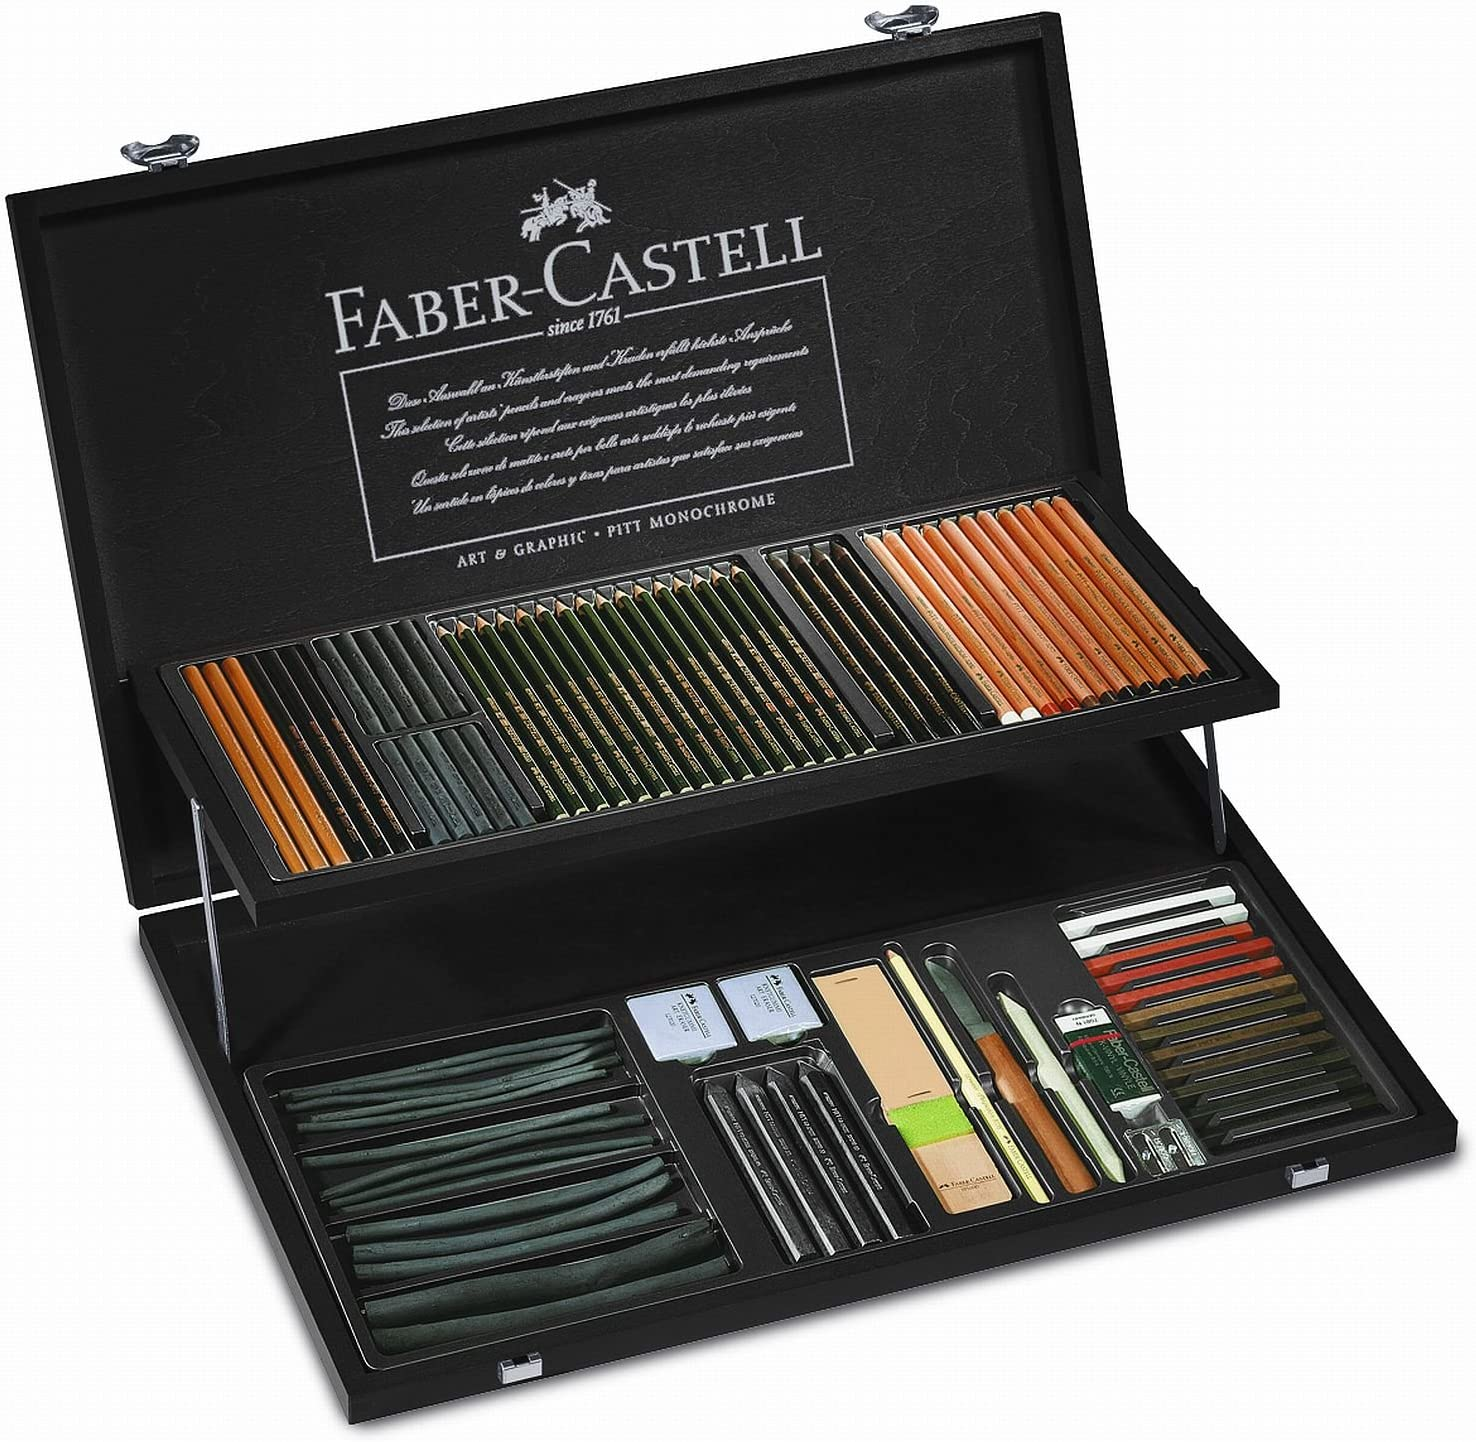 Faber-Castell Pitt Artistas Kit para dibujo profesional: Amazon.es: Oficina y papelería